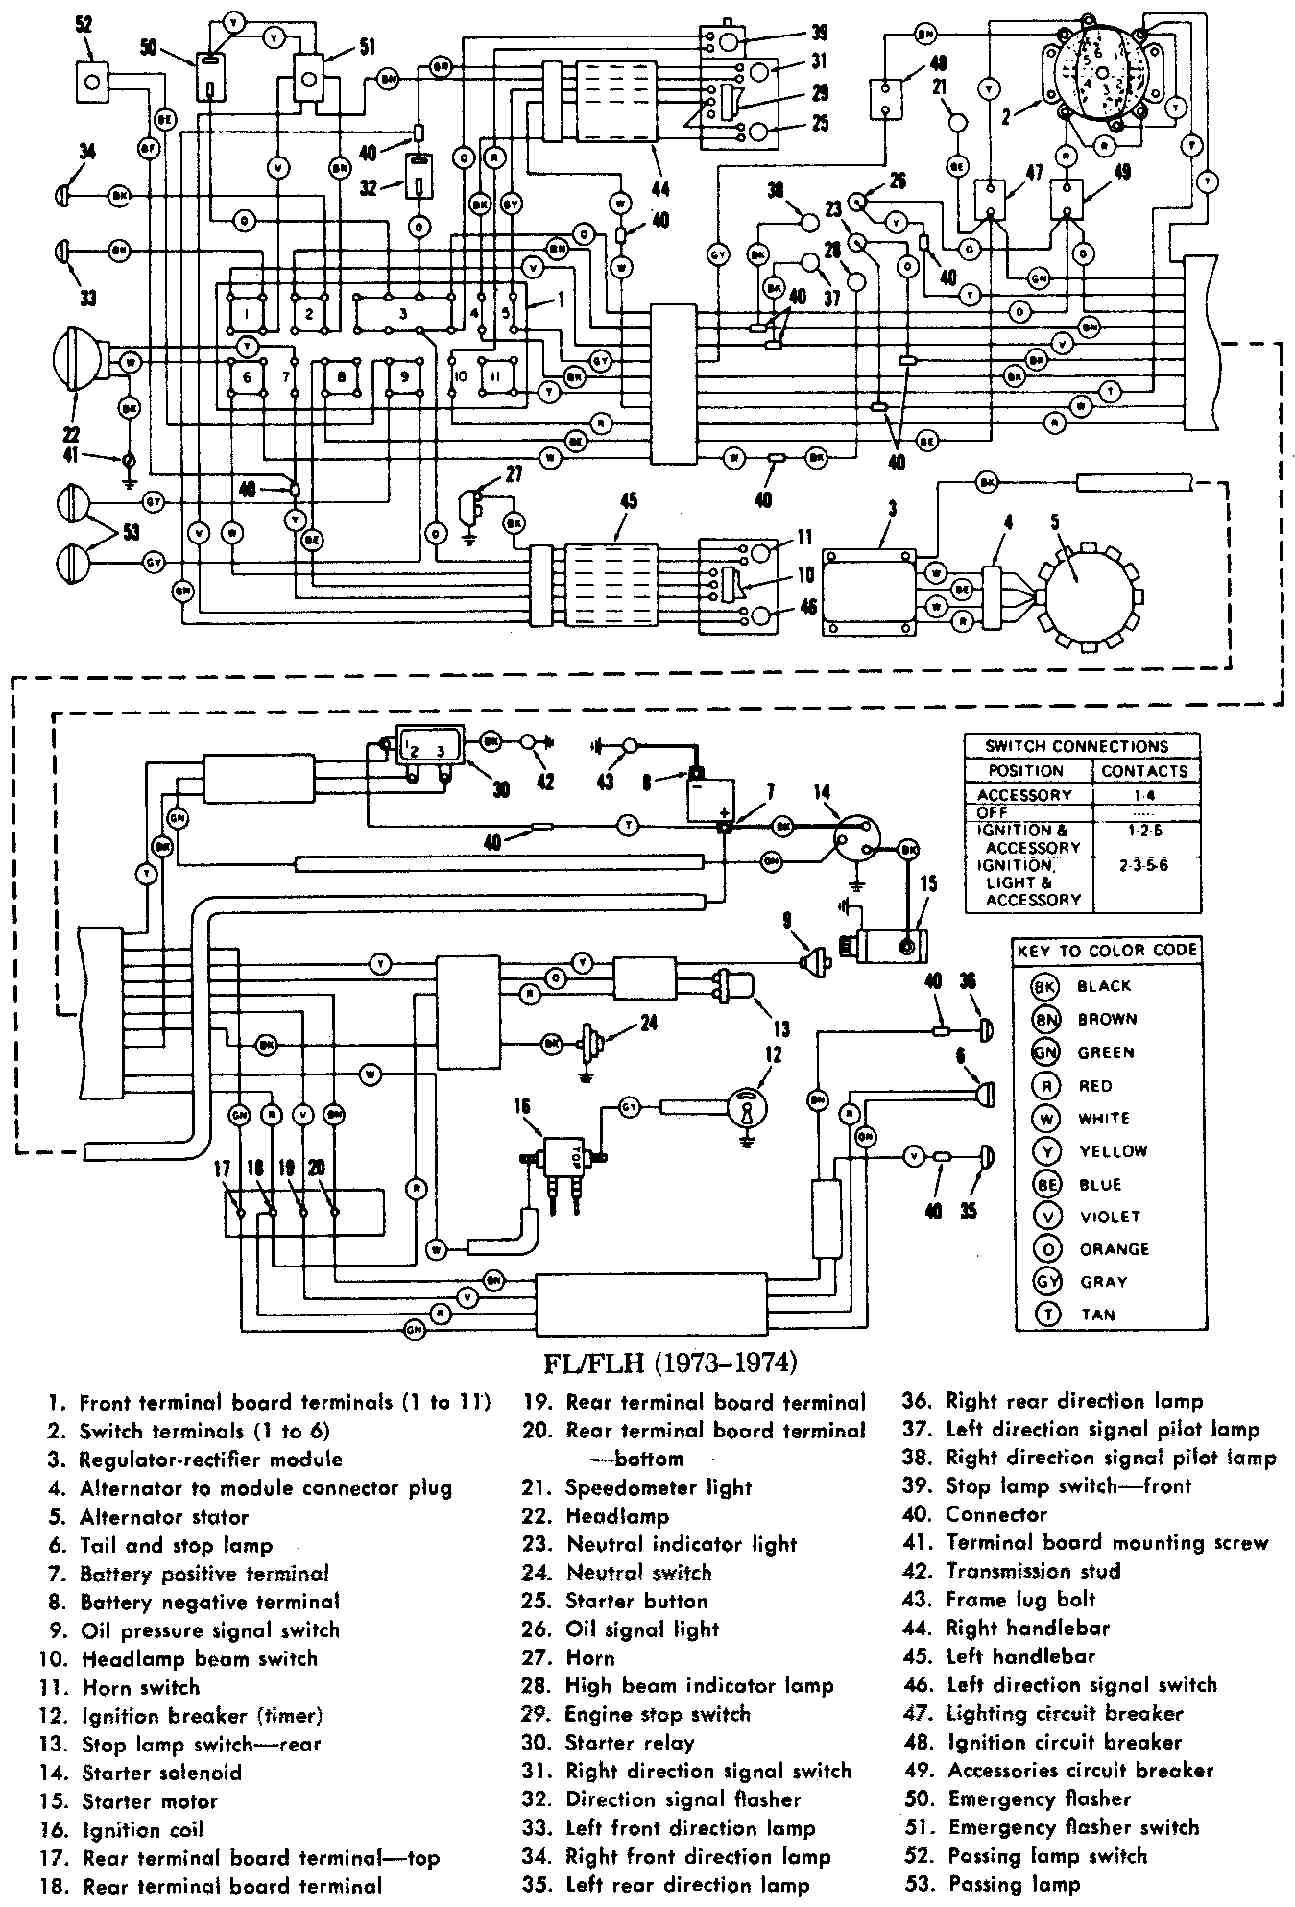 medium resolution of 1992 harley davidson 1200 sportster wiring diagram circuit diagram harley night train wiring diagram 1992 harley davidson 1200 sportster wiring diagram